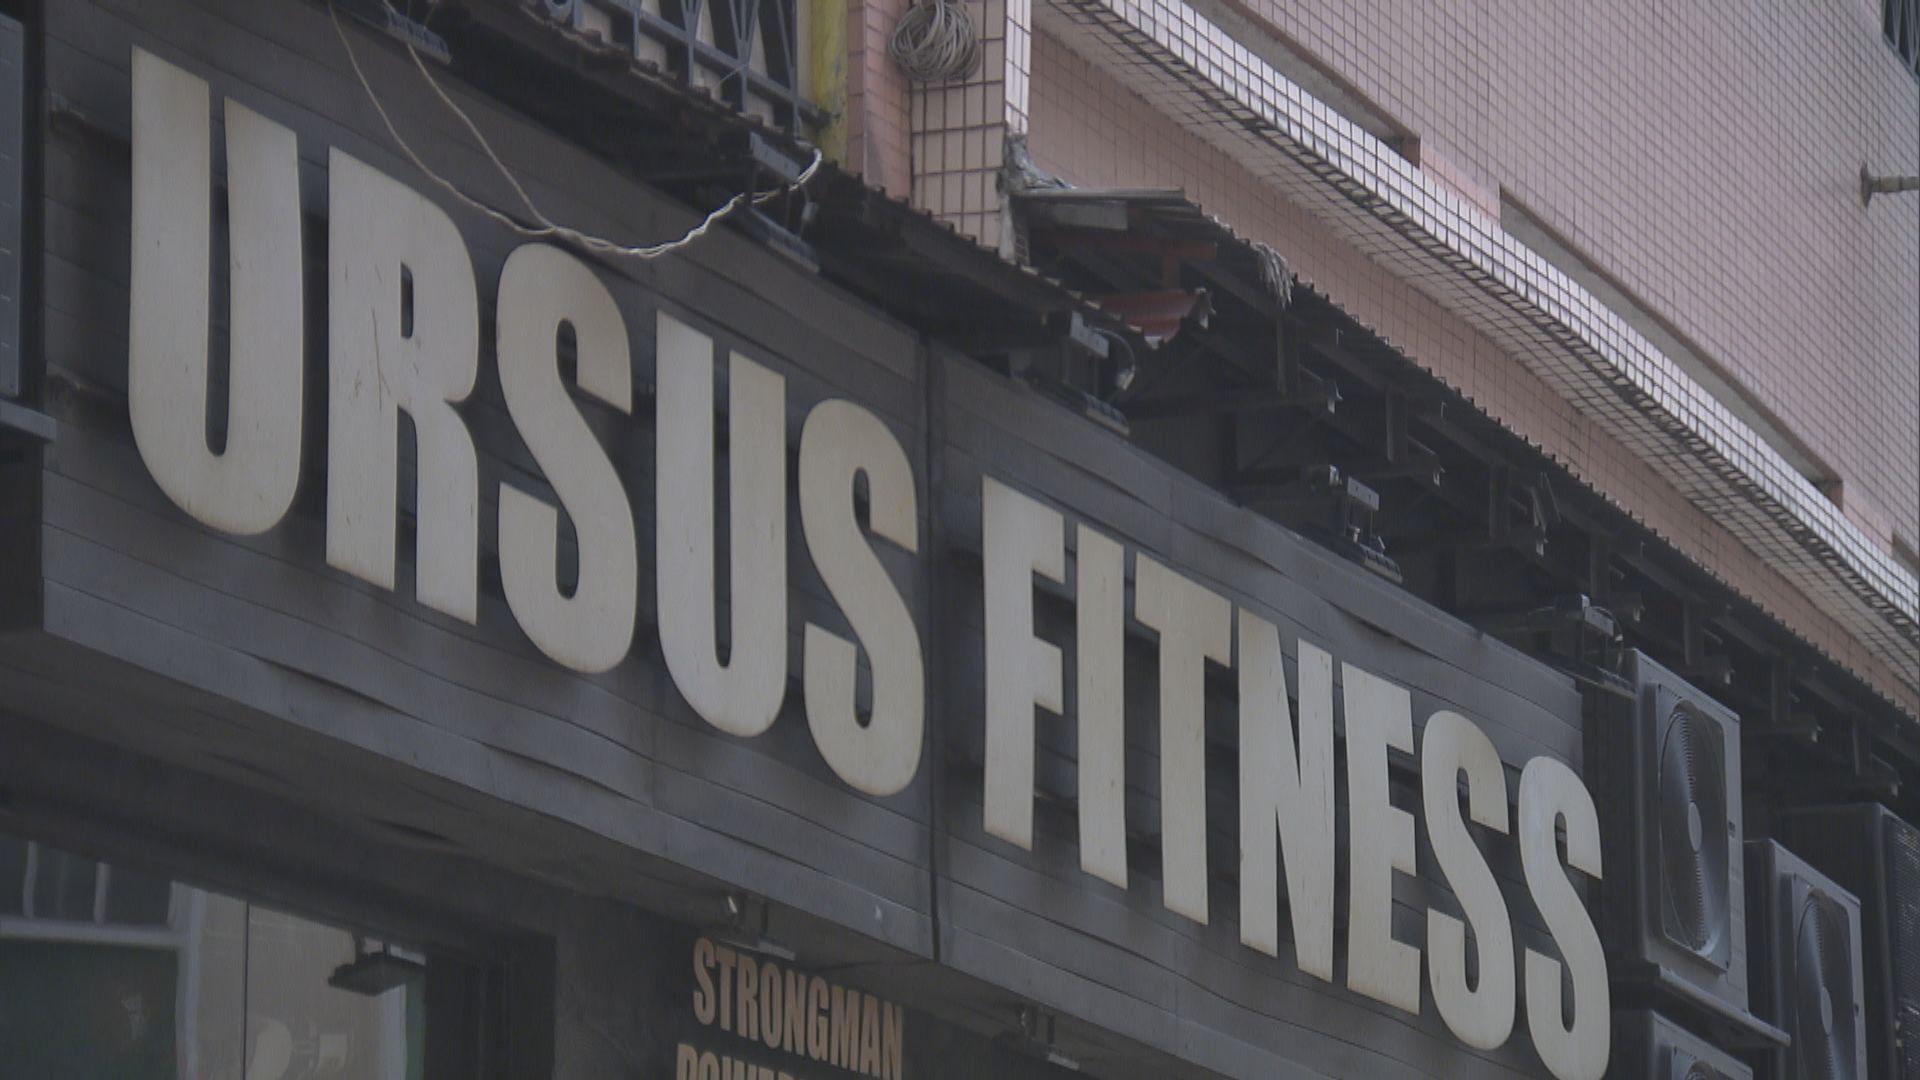 港增60宗確診 Ursus Fitness多47人染疫